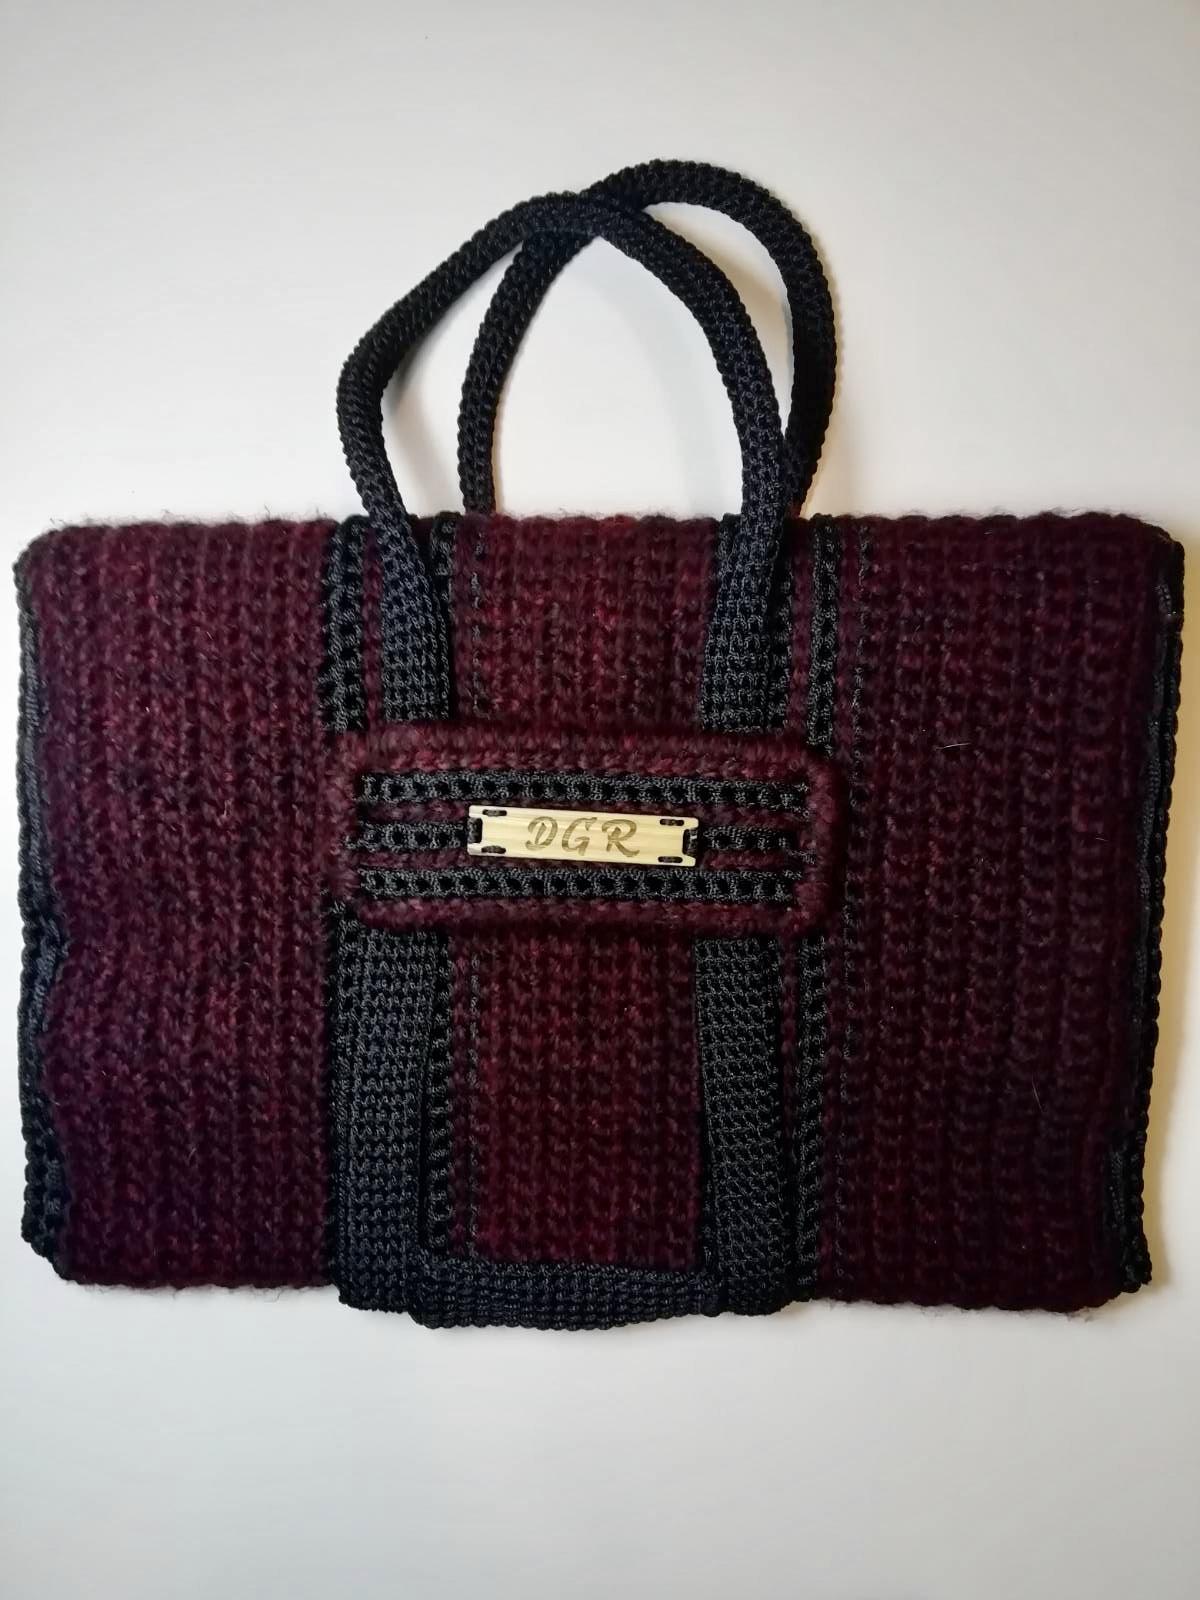 """Curly Horse"" crochet Bag in bordeaux/black"